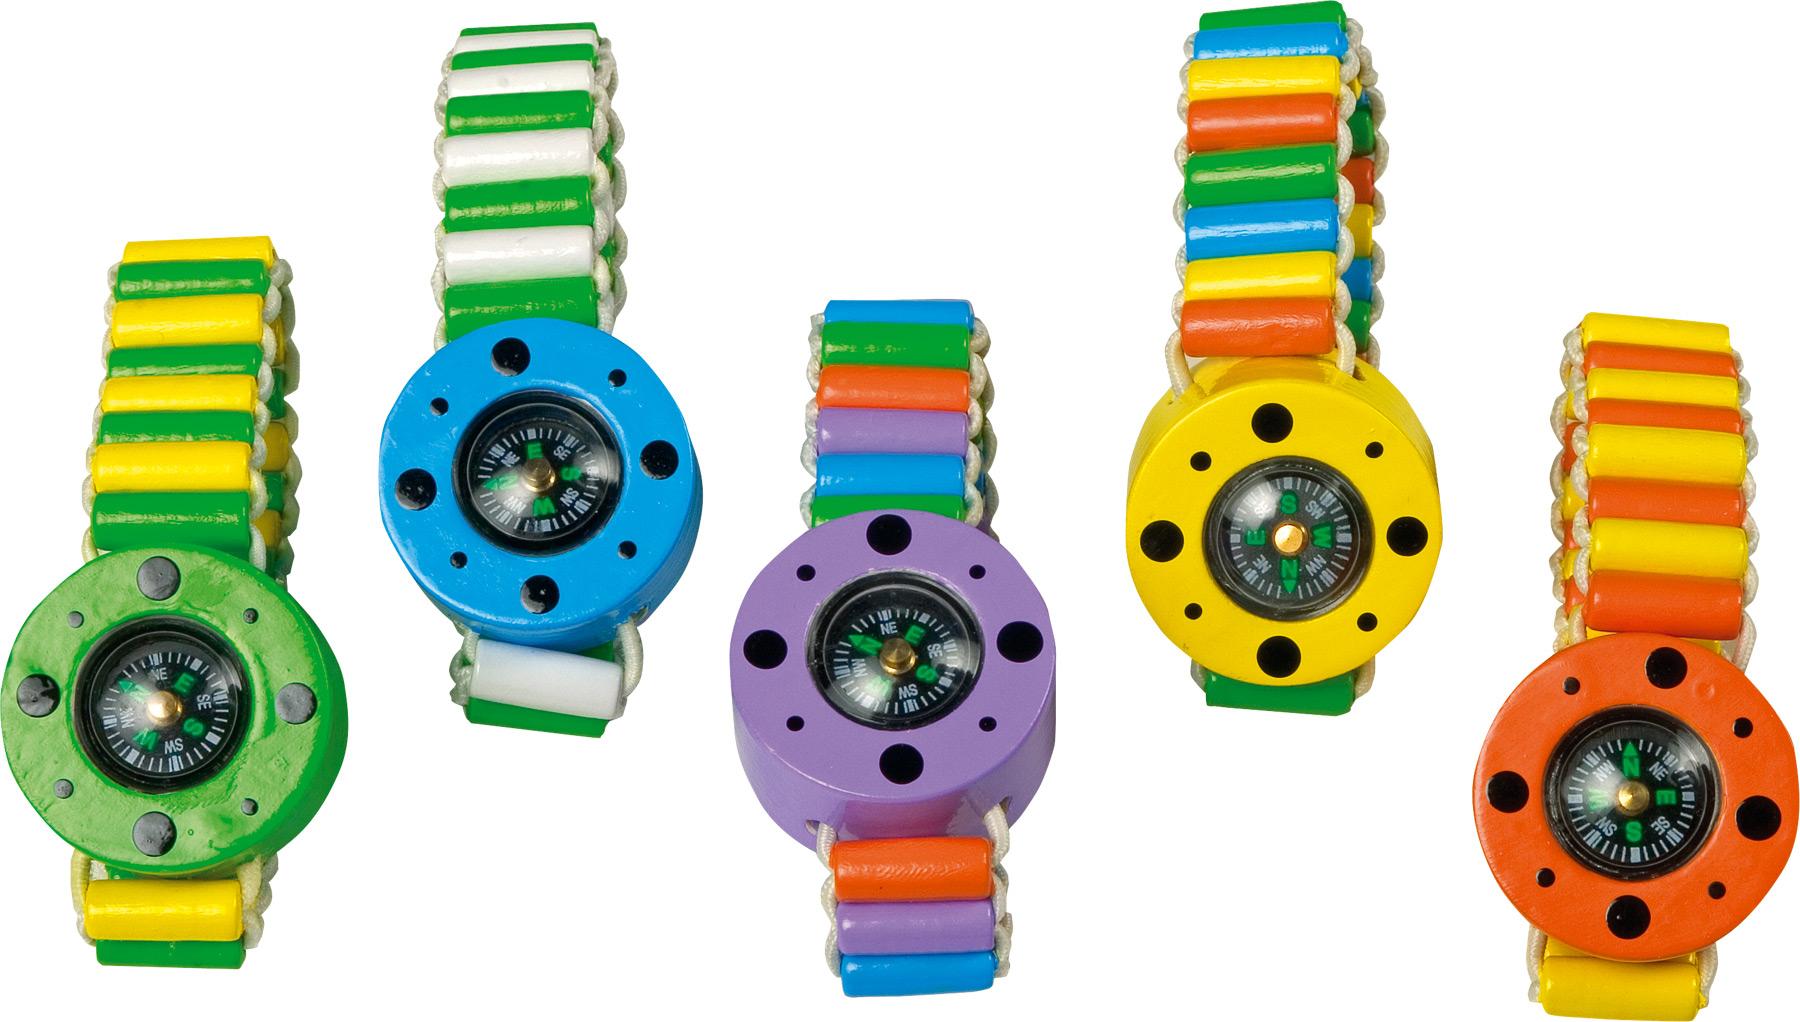 Small Foot Dřevěný barevný náramek kompas 5 ks